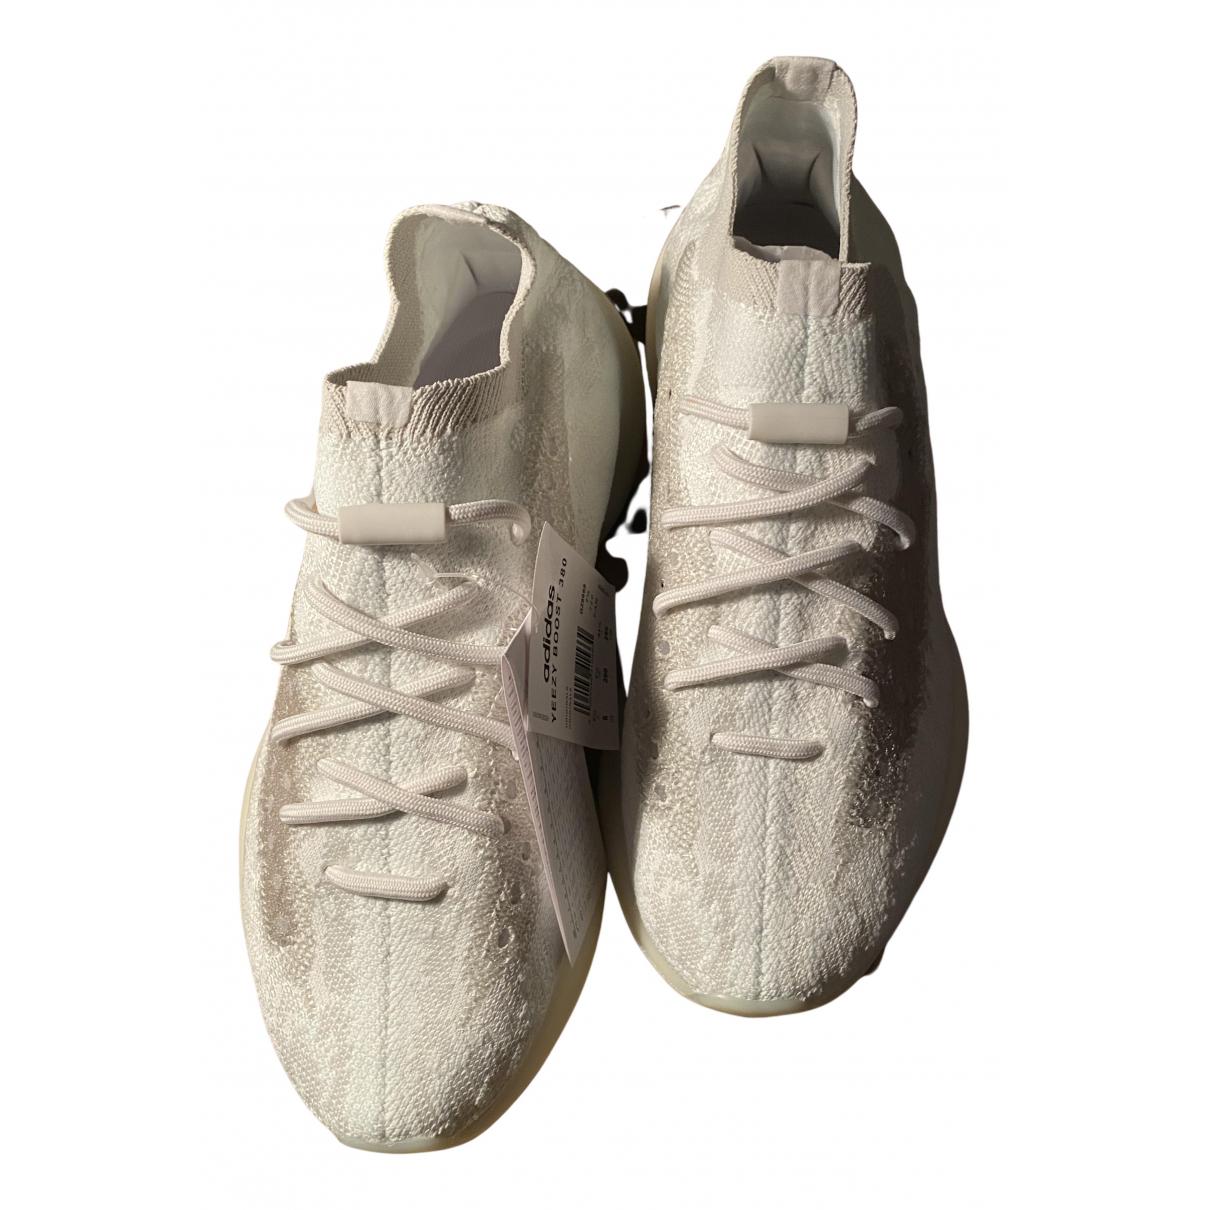 Deportivas Boost 380 de Lona Yeezy X Adidas